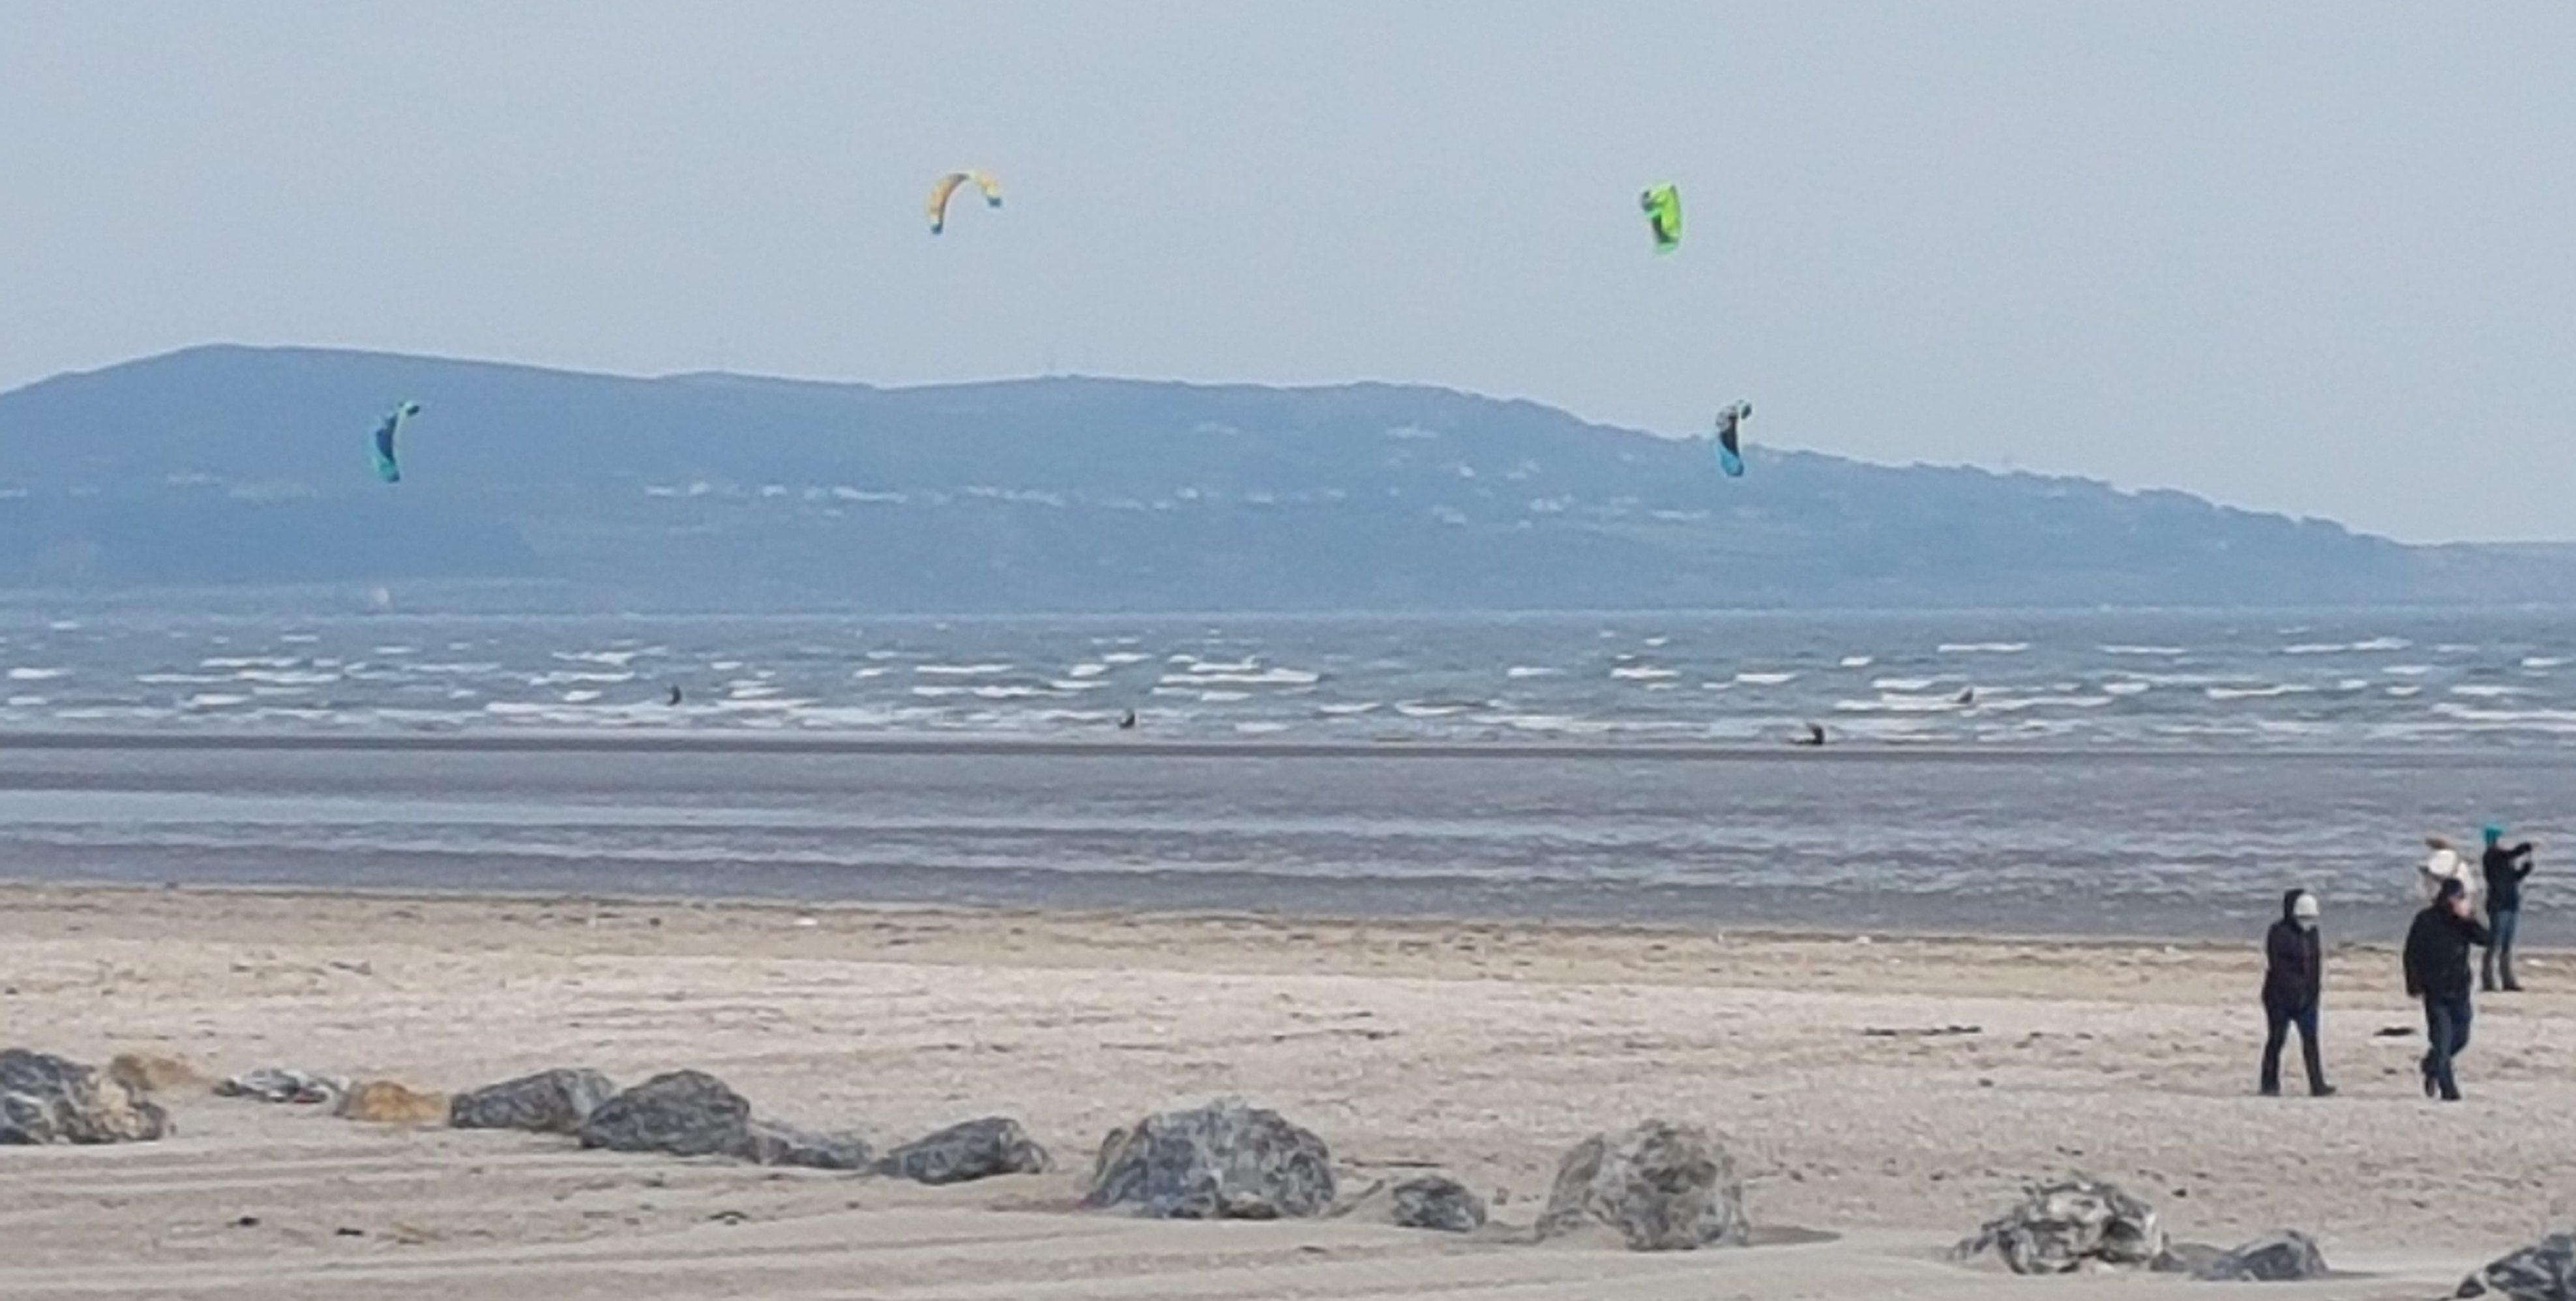 kite size kitesurfing